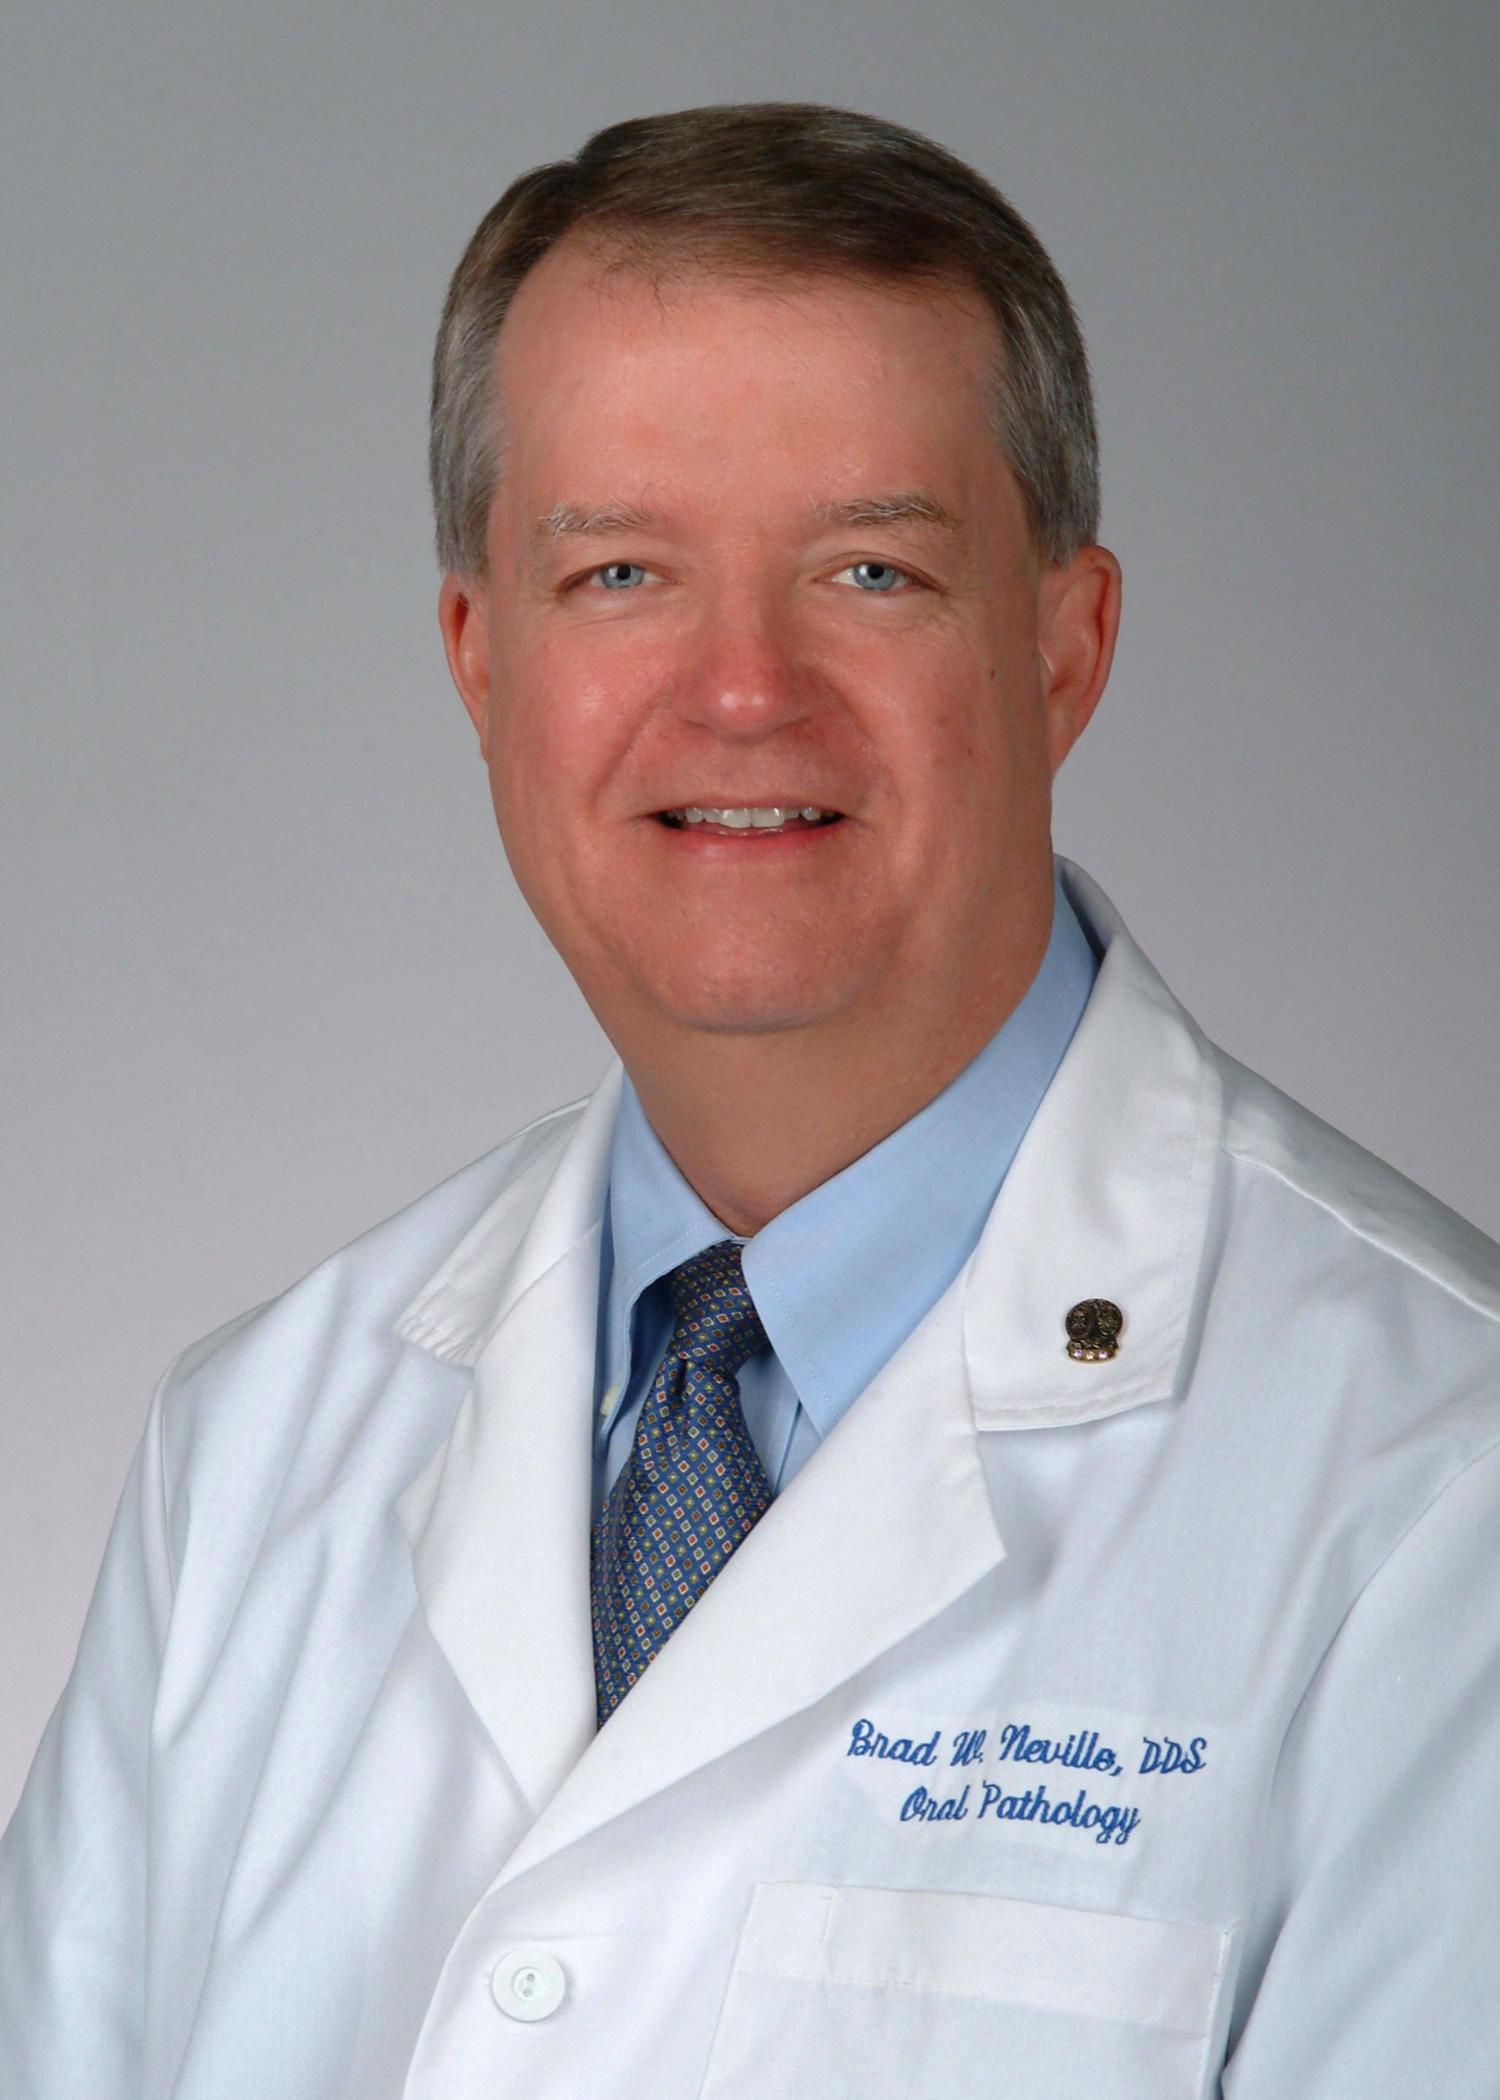 Brad W Neville, DDS General Dentistry